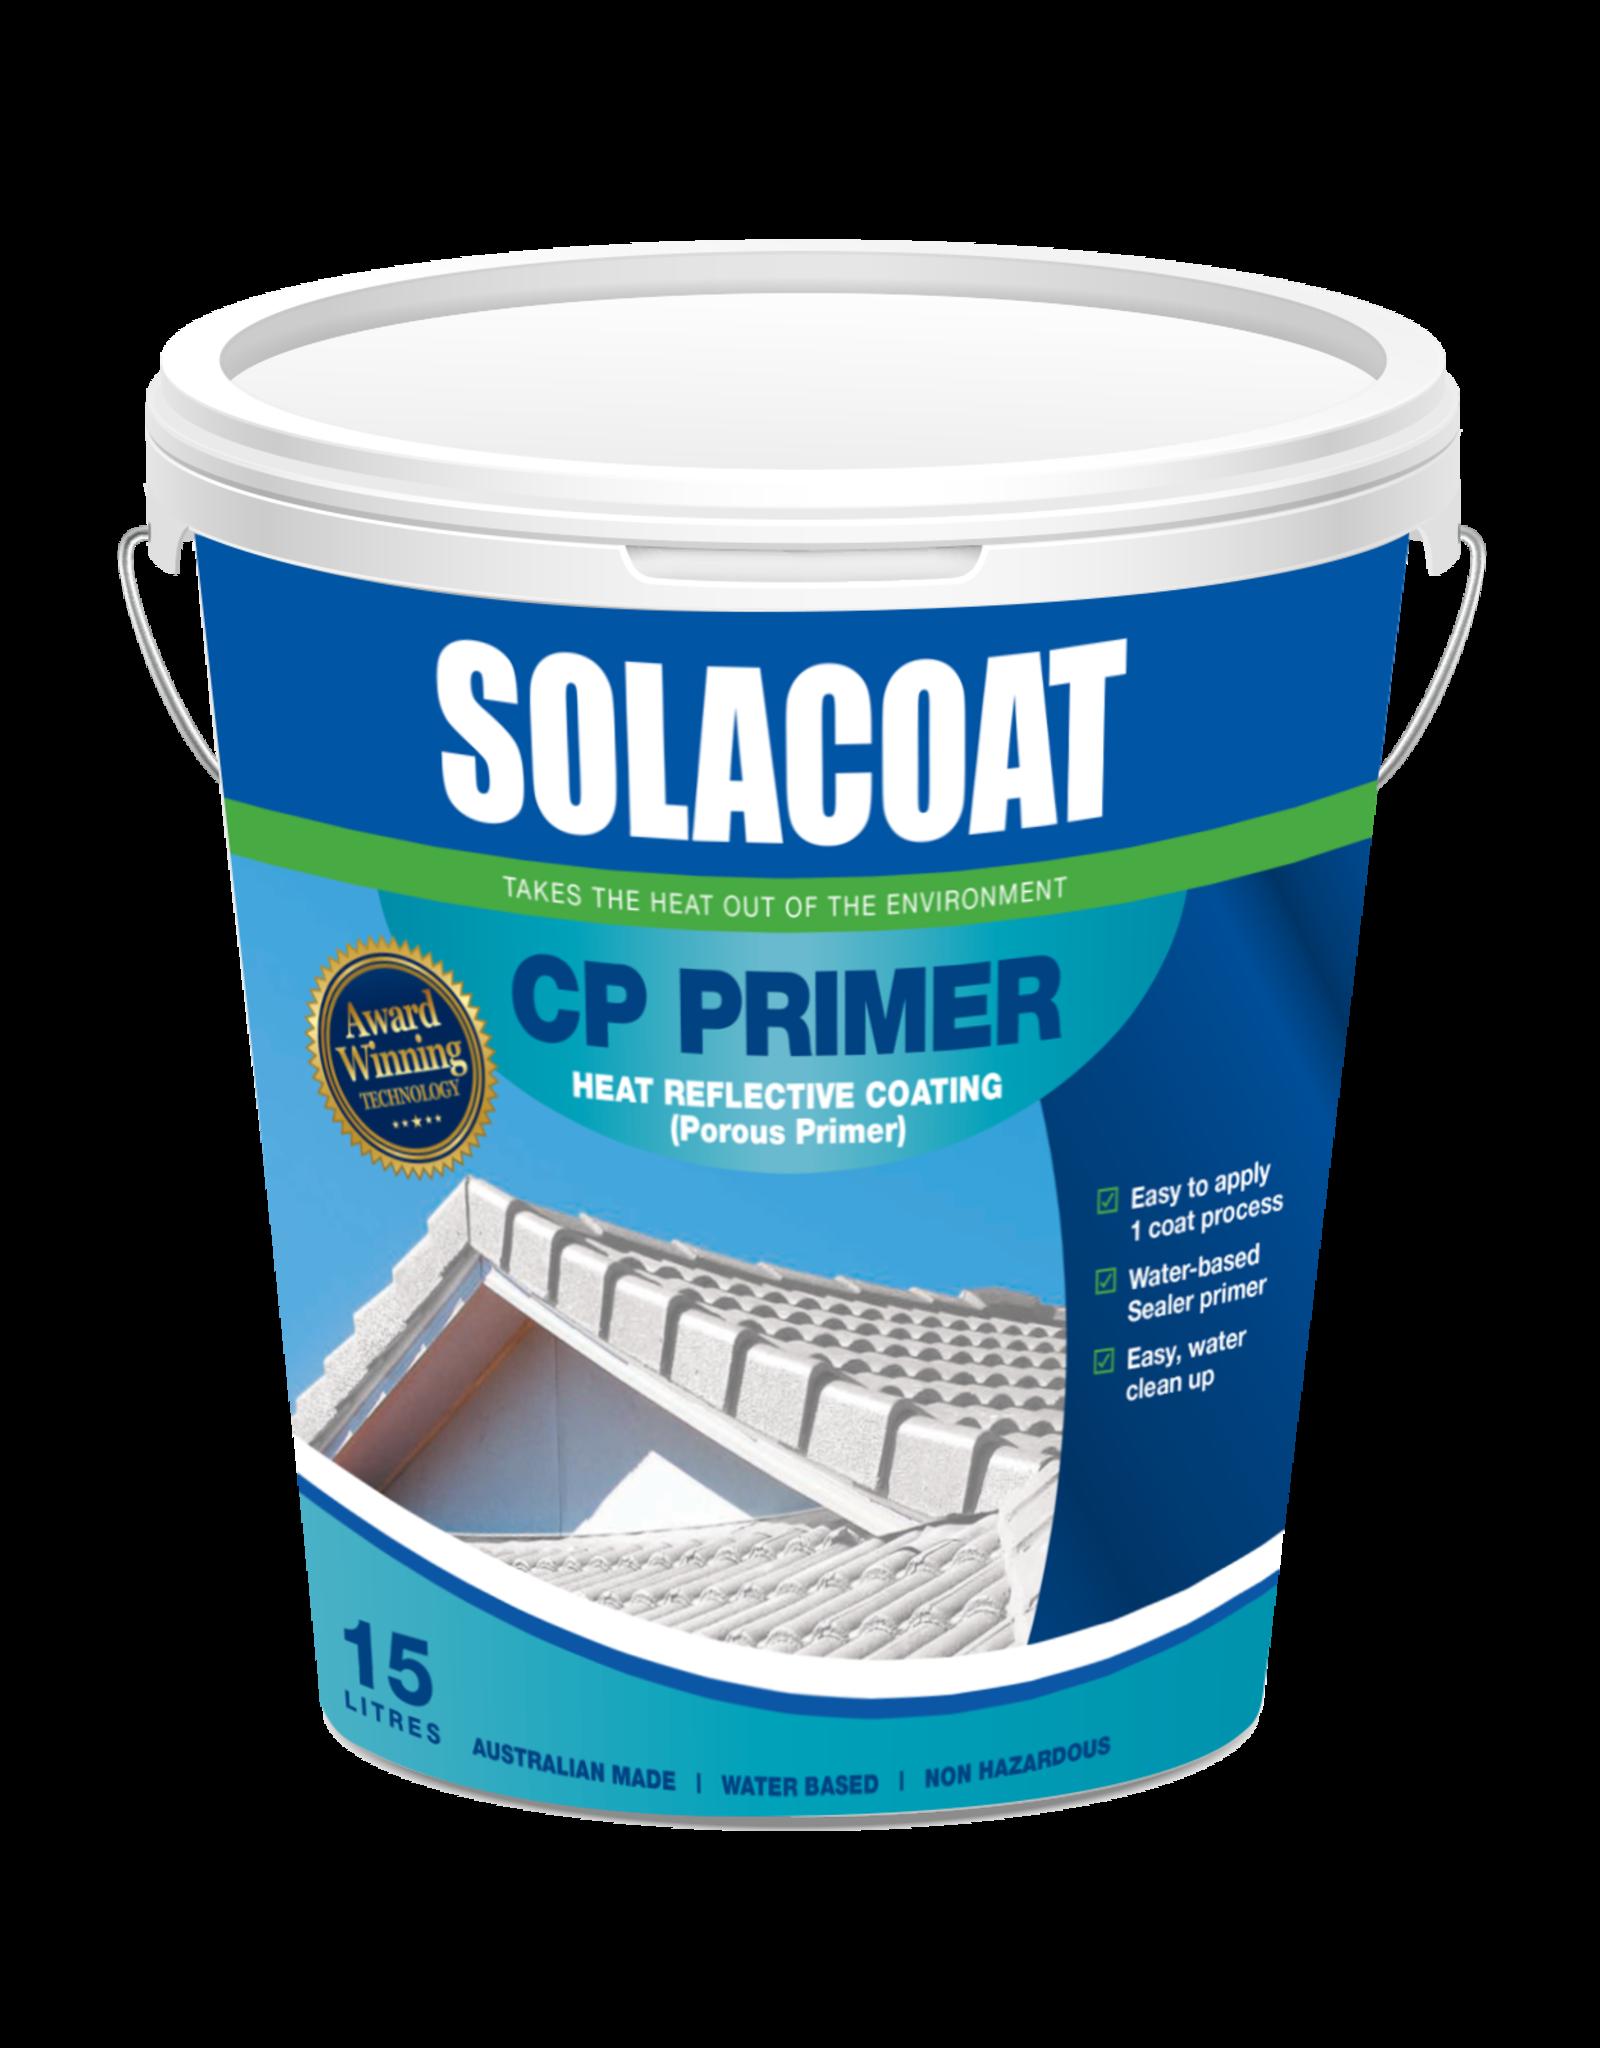 COOLSHEILD SOLACOAT Heat Reflective PRIMERS